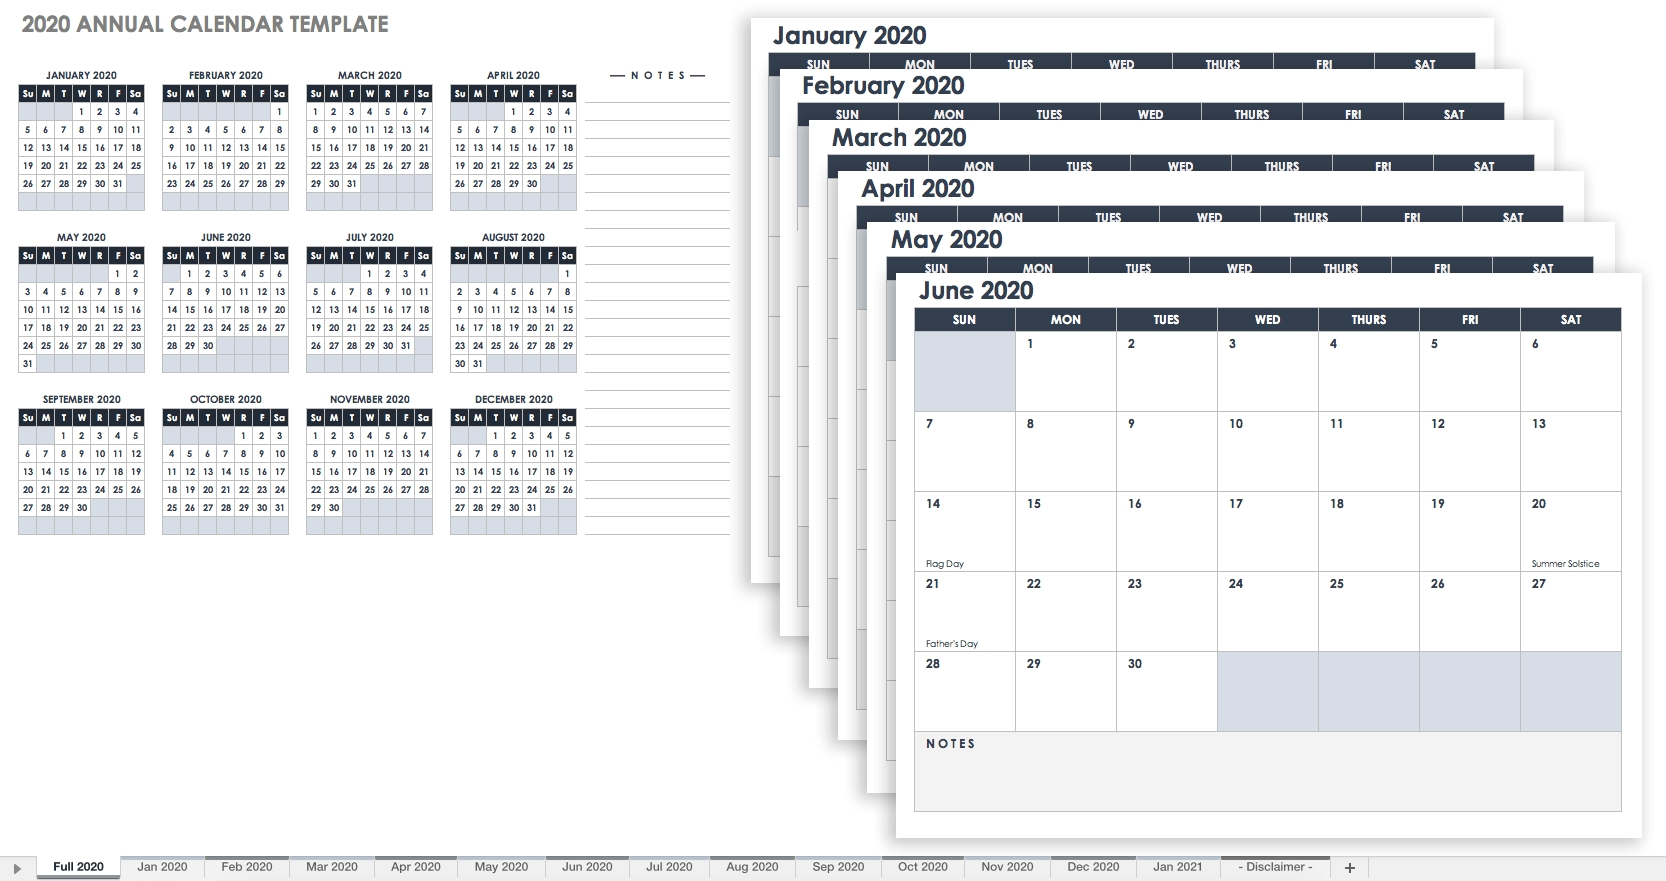 Free, Printable Excel Calendar Templates For 2019 & On | Smartsheet within Weekly Free Print Calendar 2019 2020